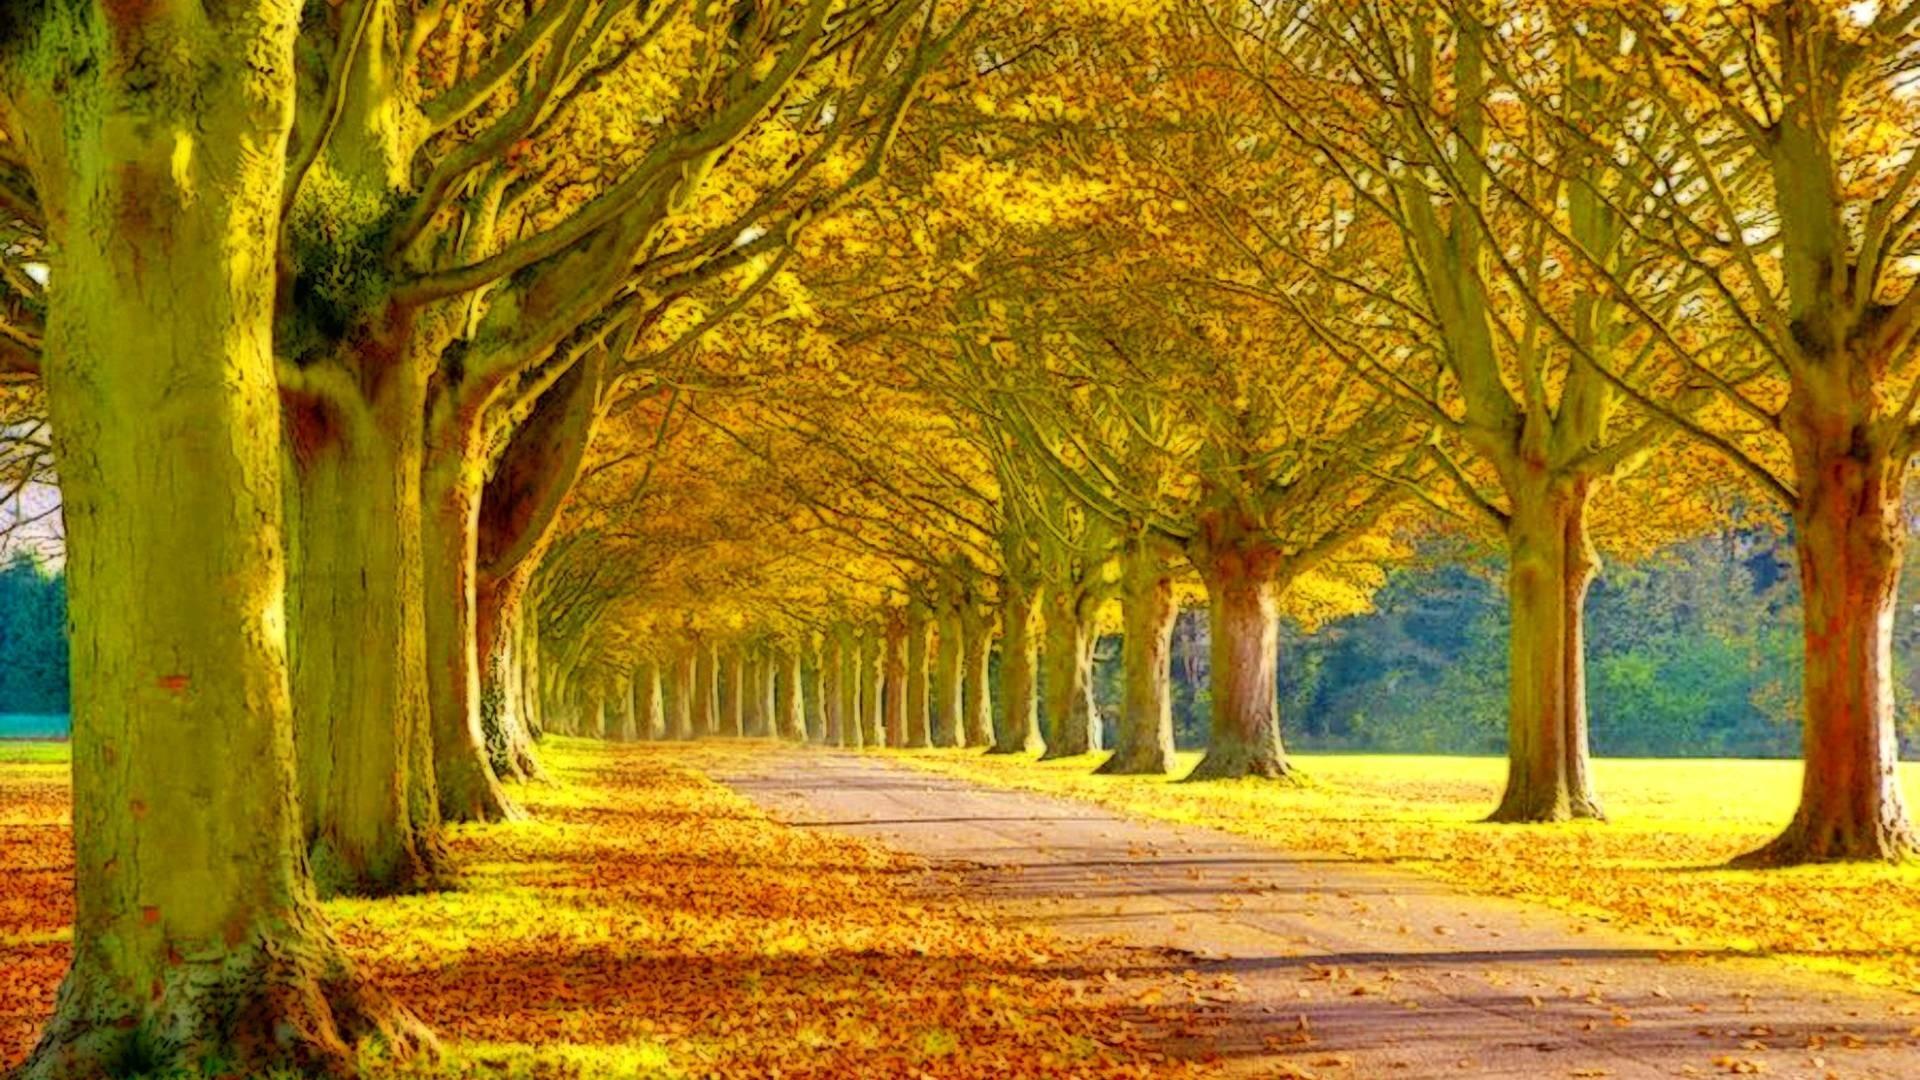 beautiful scenery backgrounds 183��